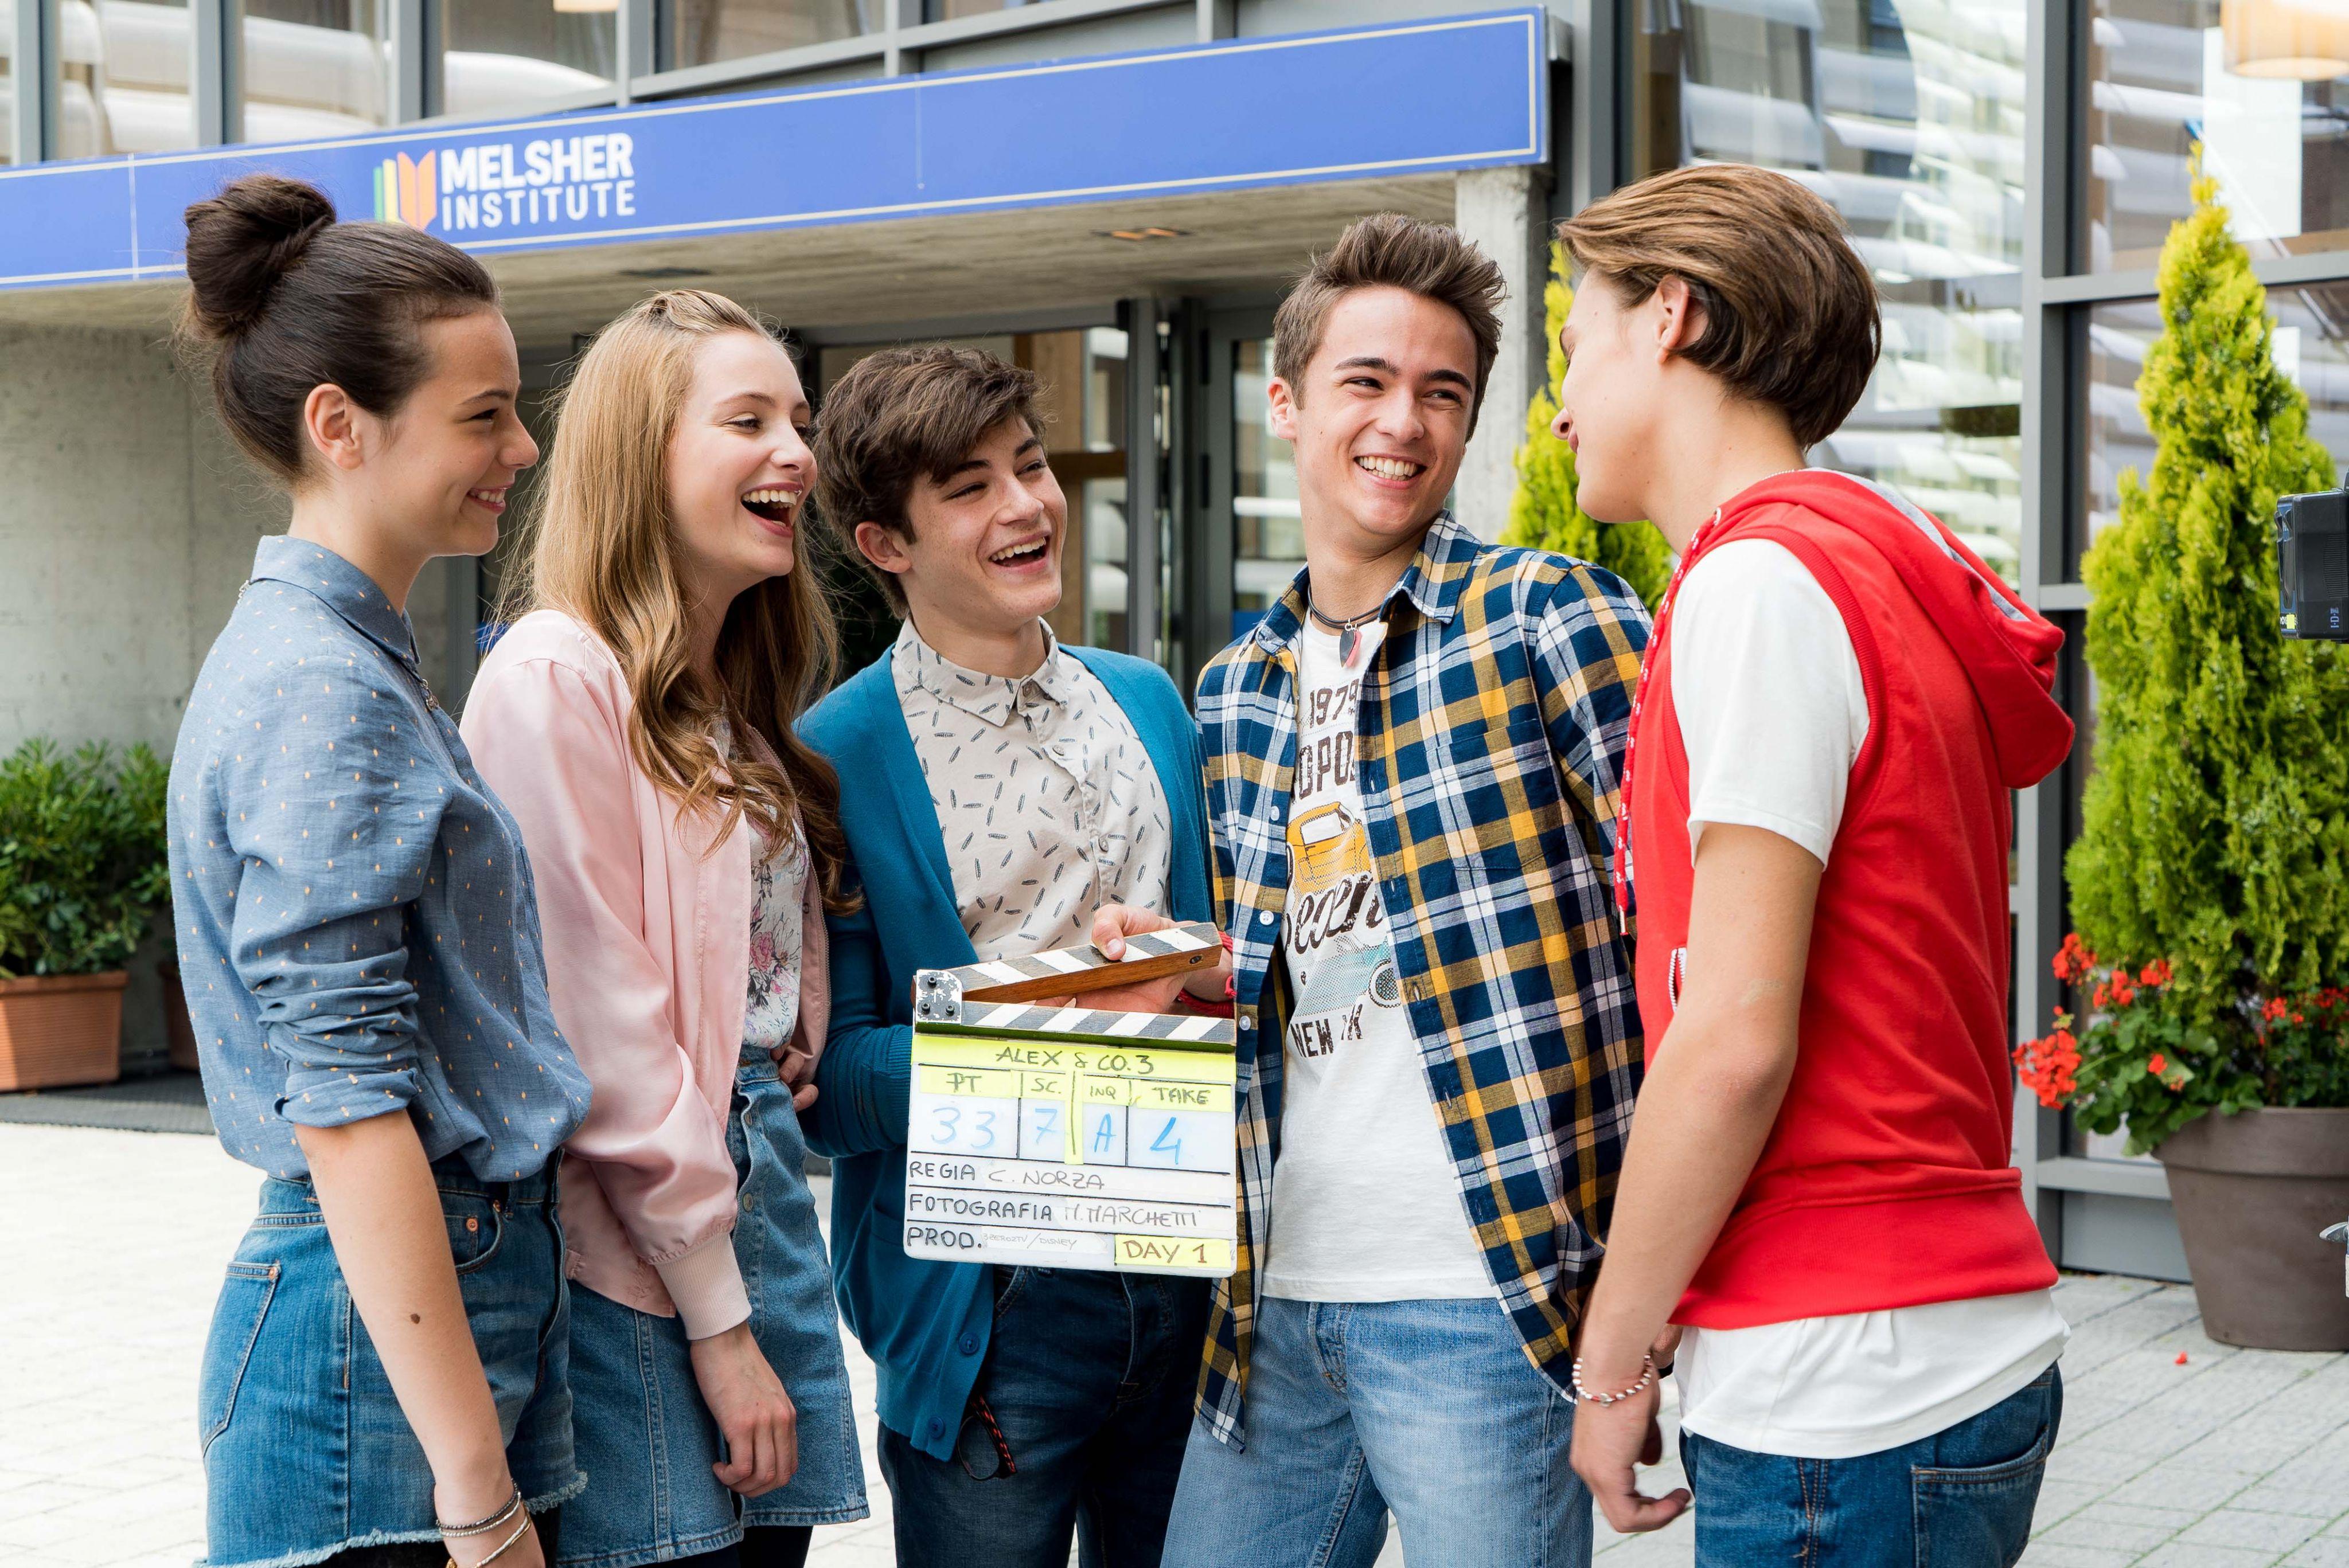 Alex & Co 2 (seconda stagione) - Movieplayer.it